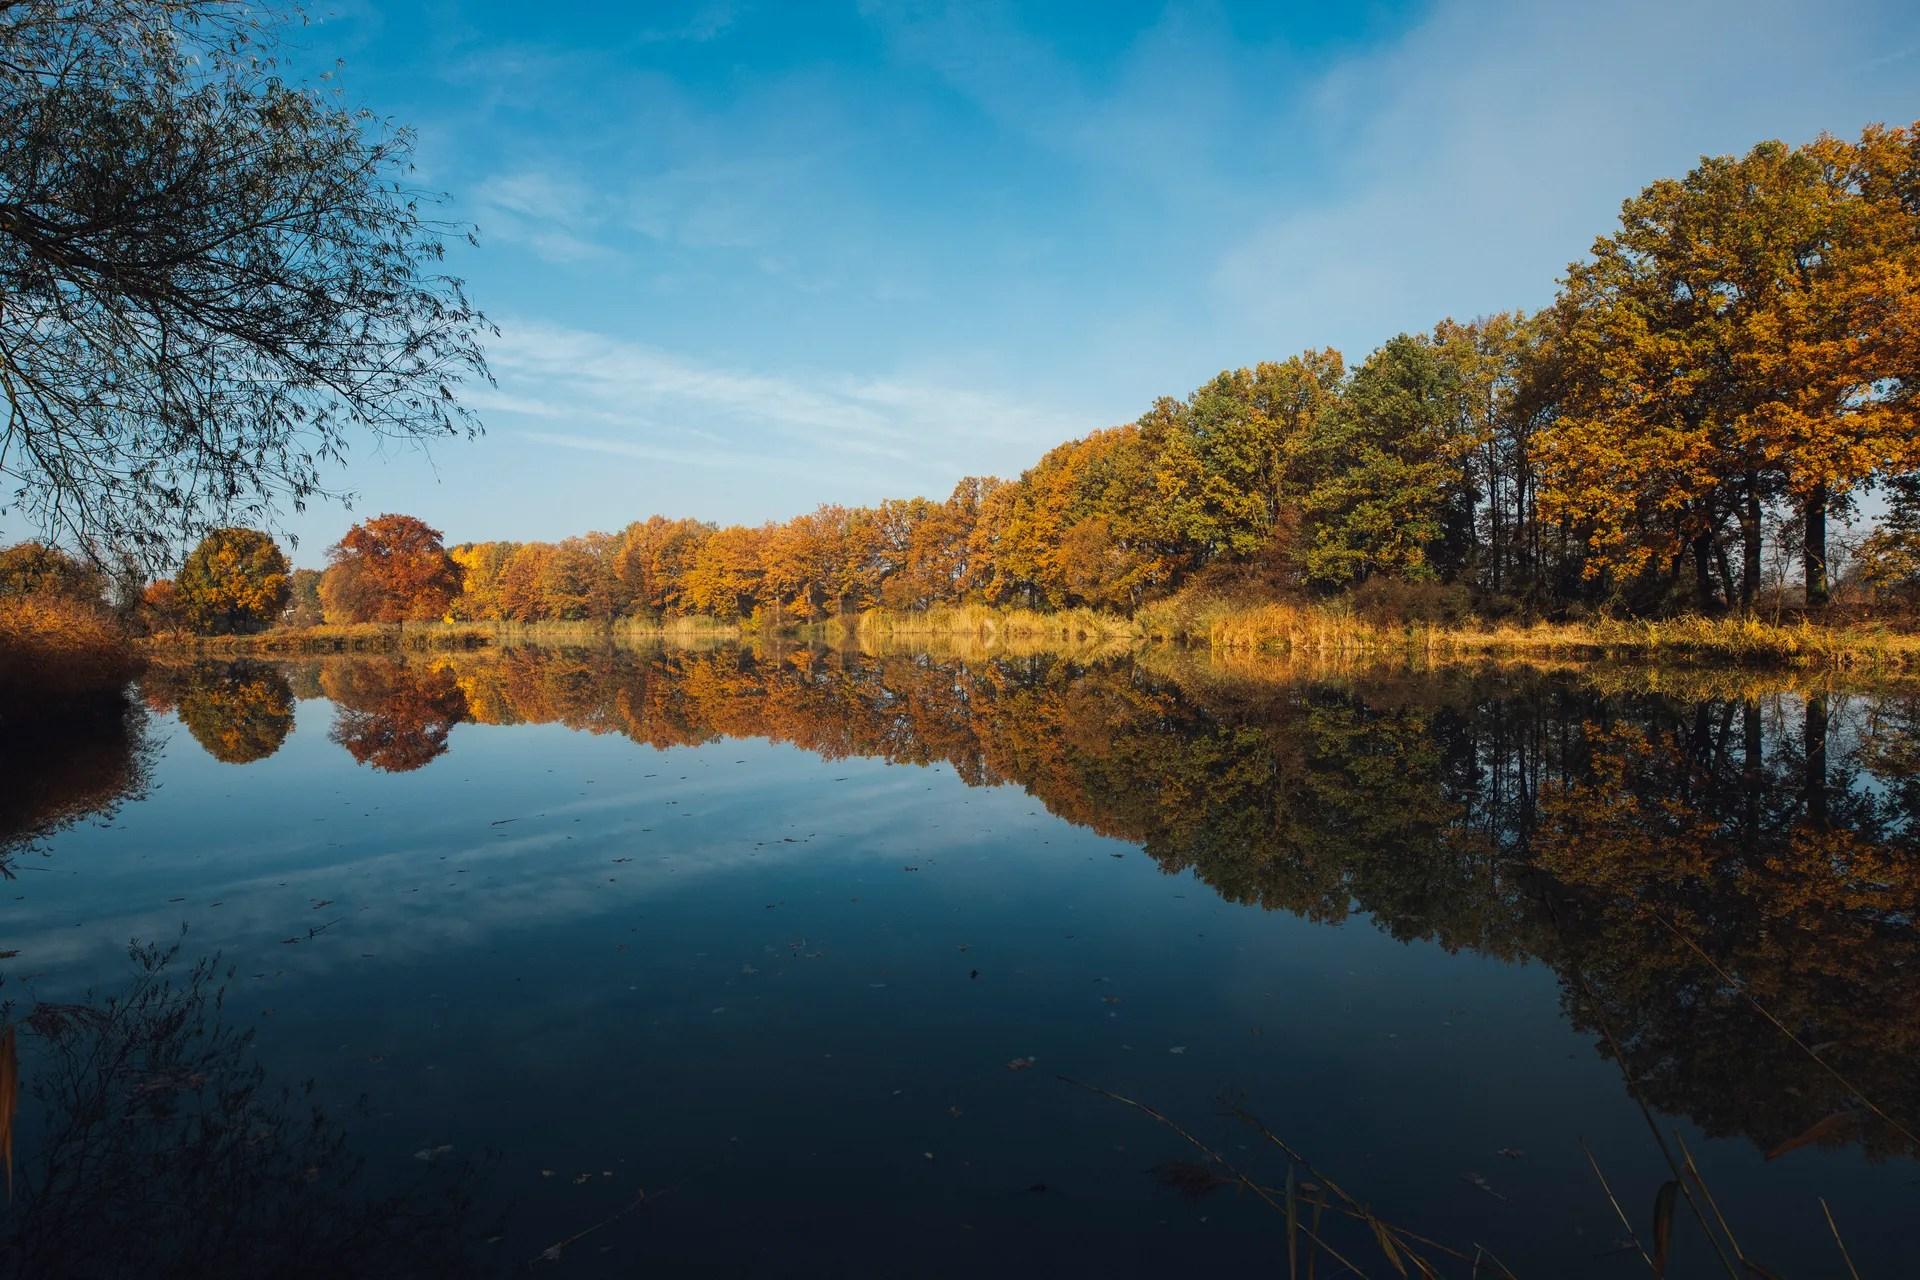 3d Motion Wallpaper Download Kinzie Street Railroad Bridge In Chicago Usa Widescreen